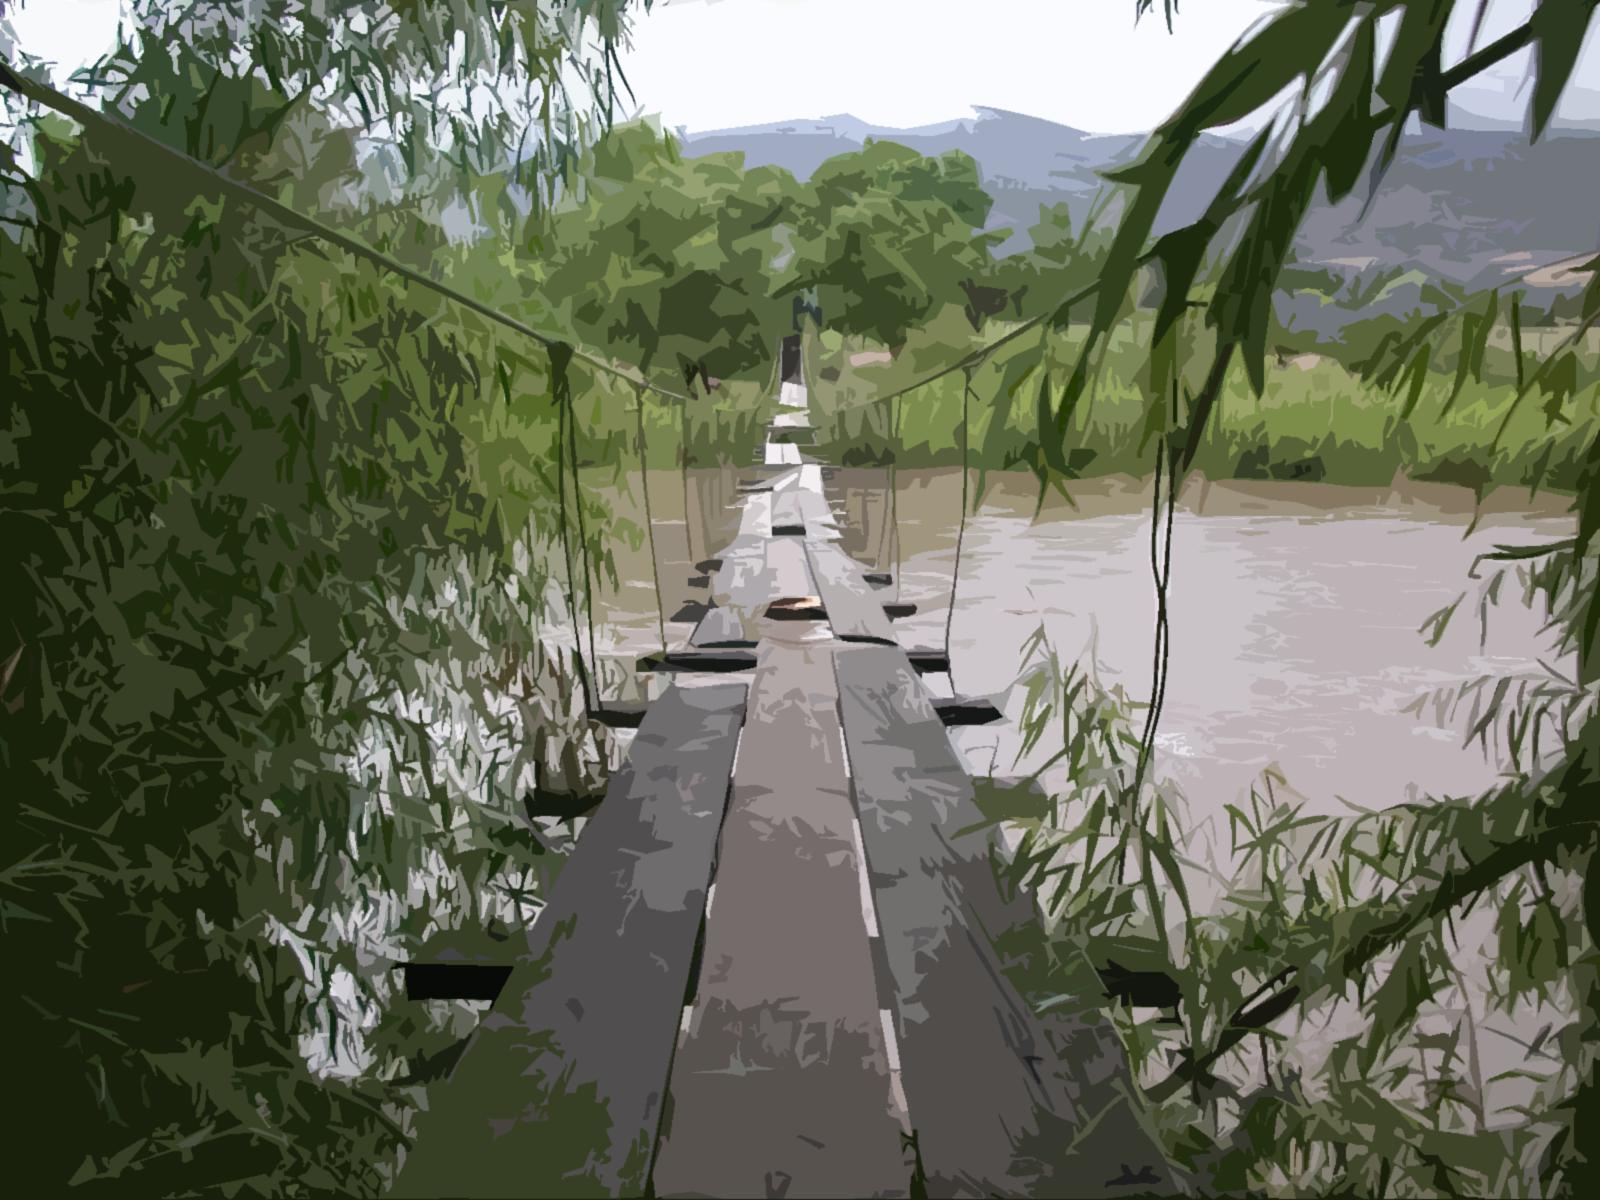 Rope Bridge by CellLogic